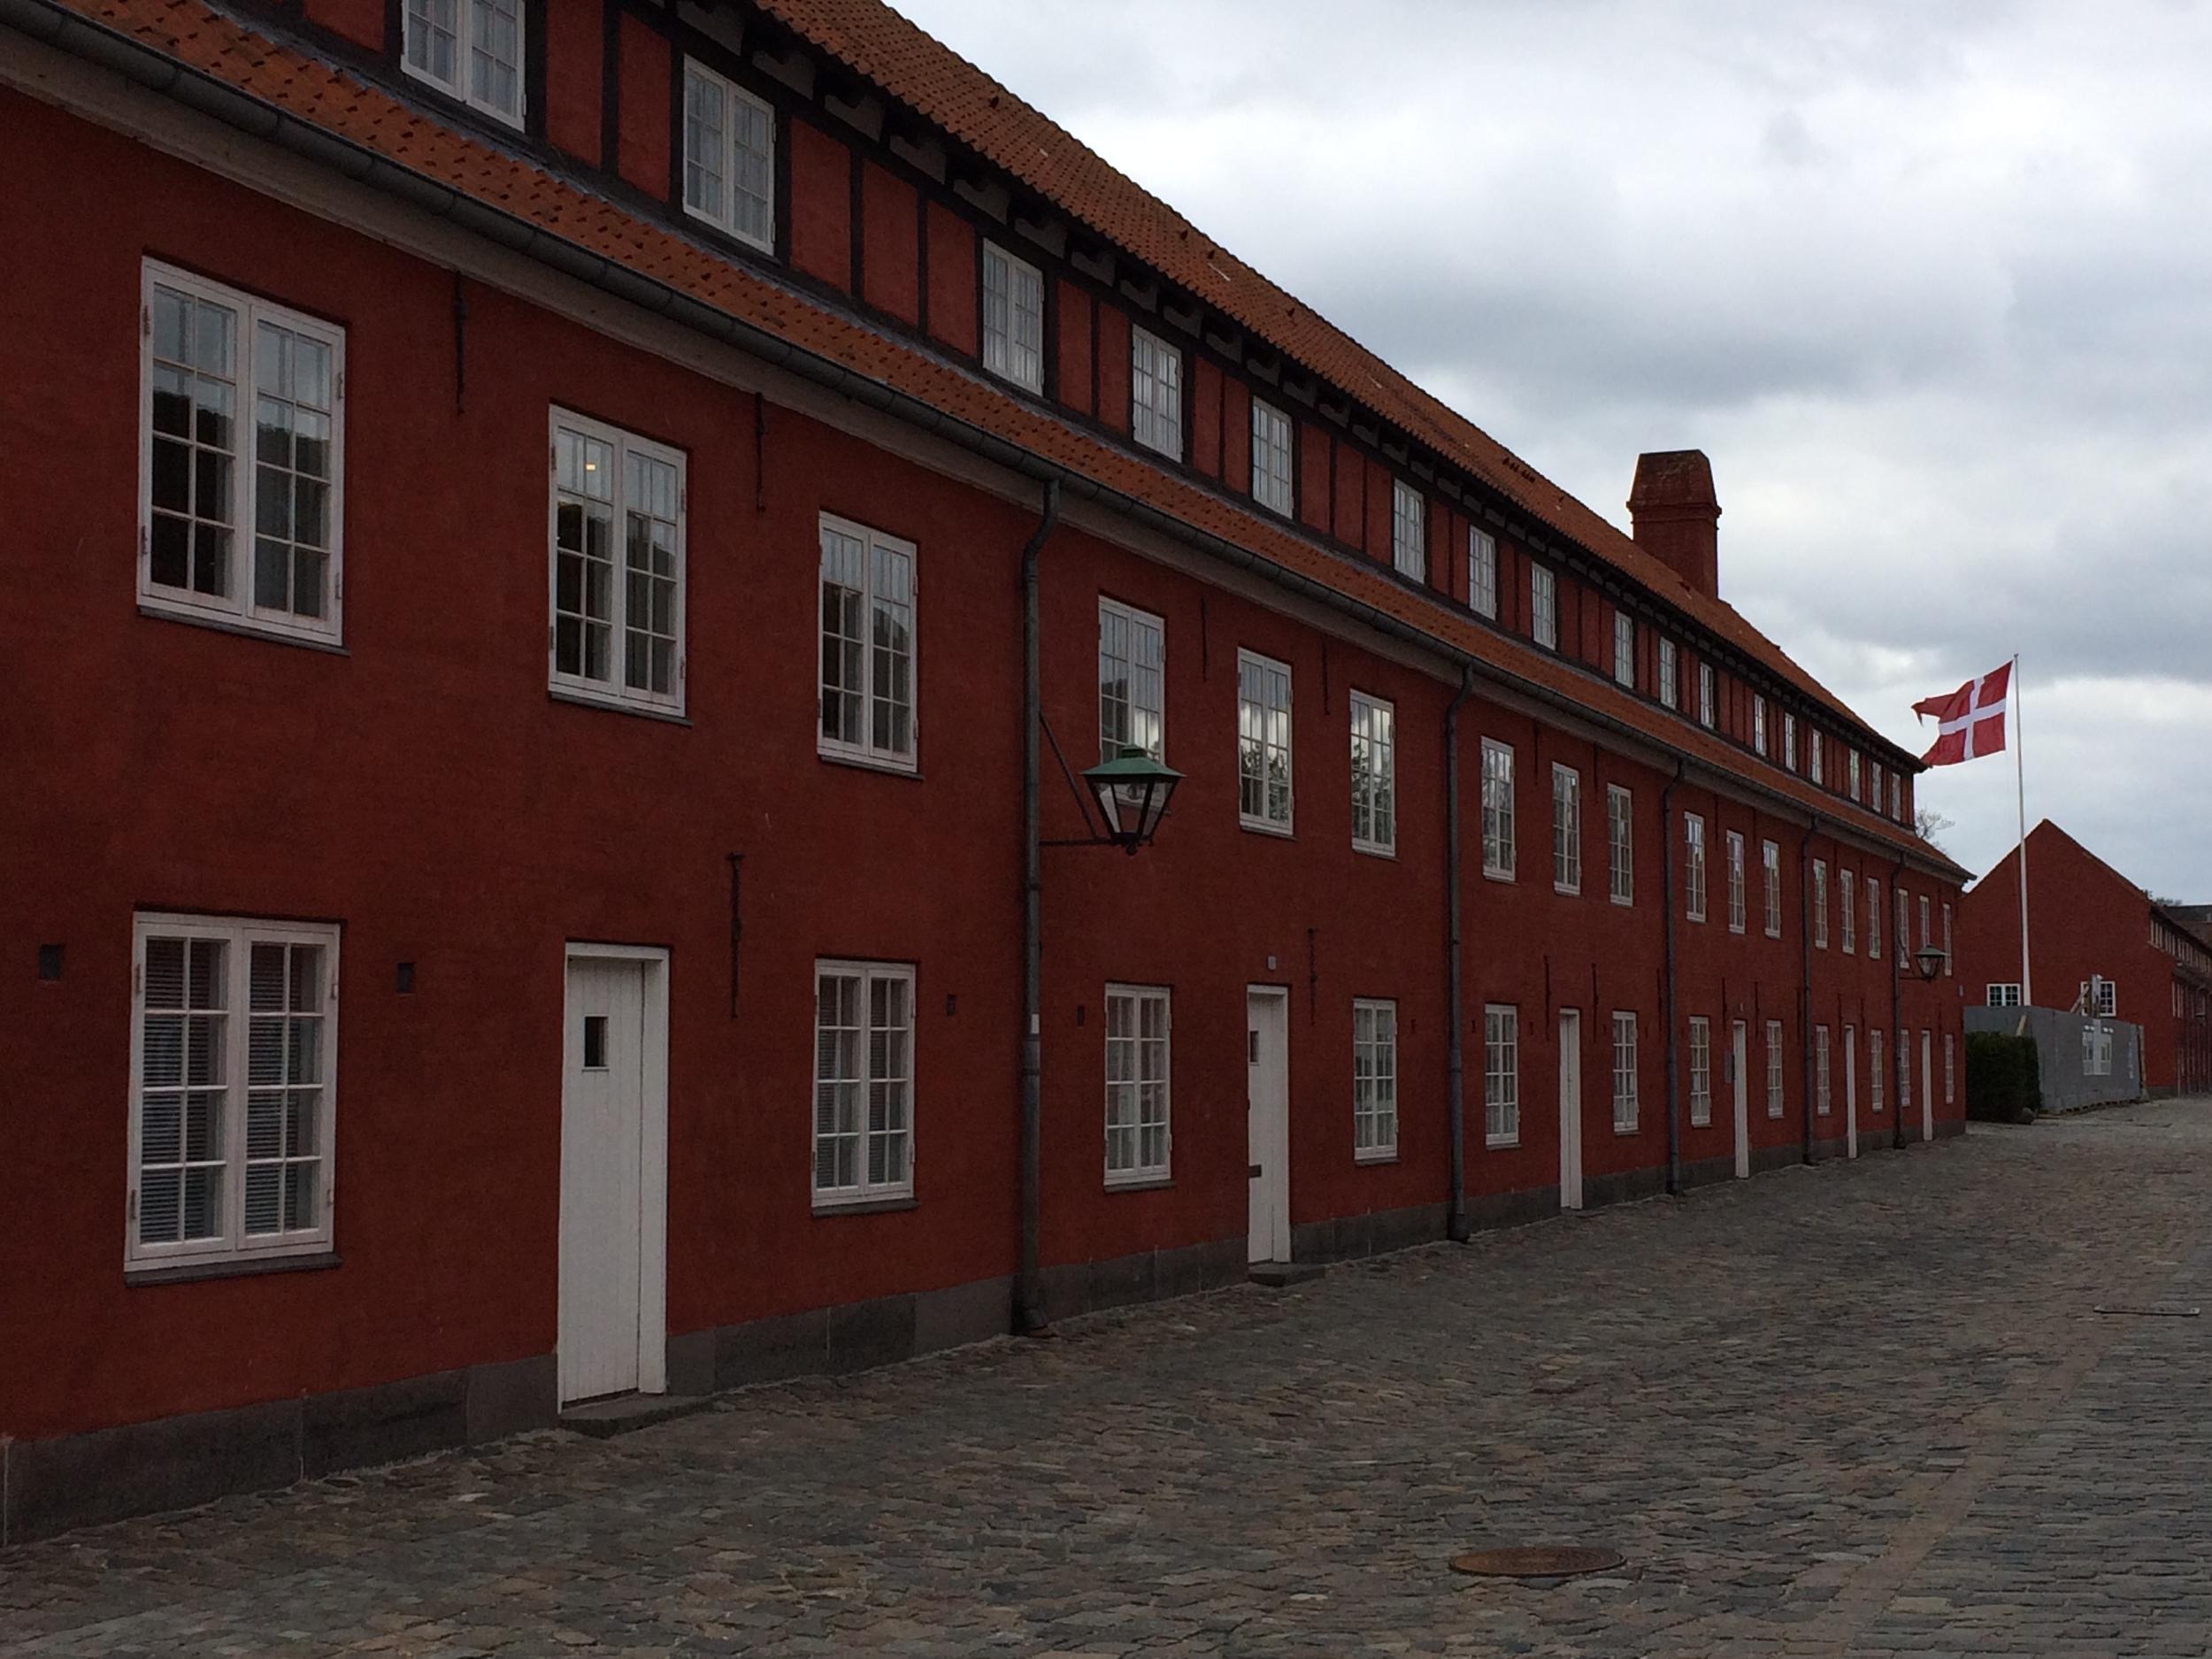 Kastellet, 17th century fortress